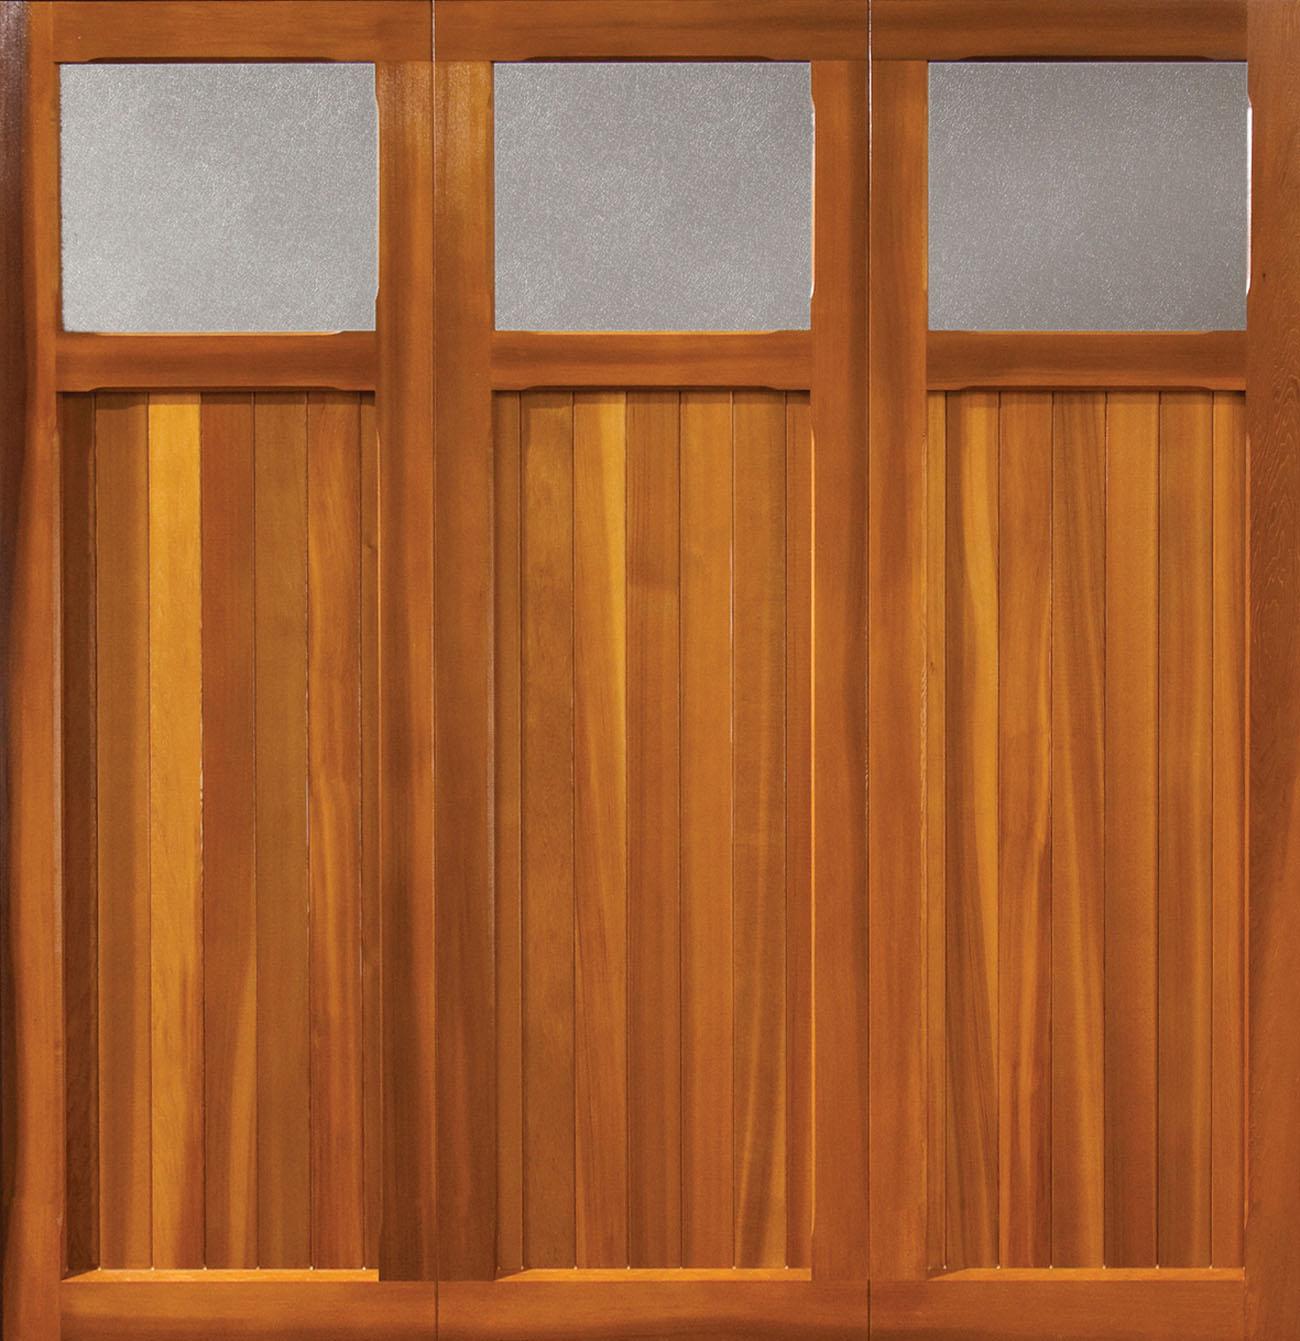 Woodrite Ickford Panel built